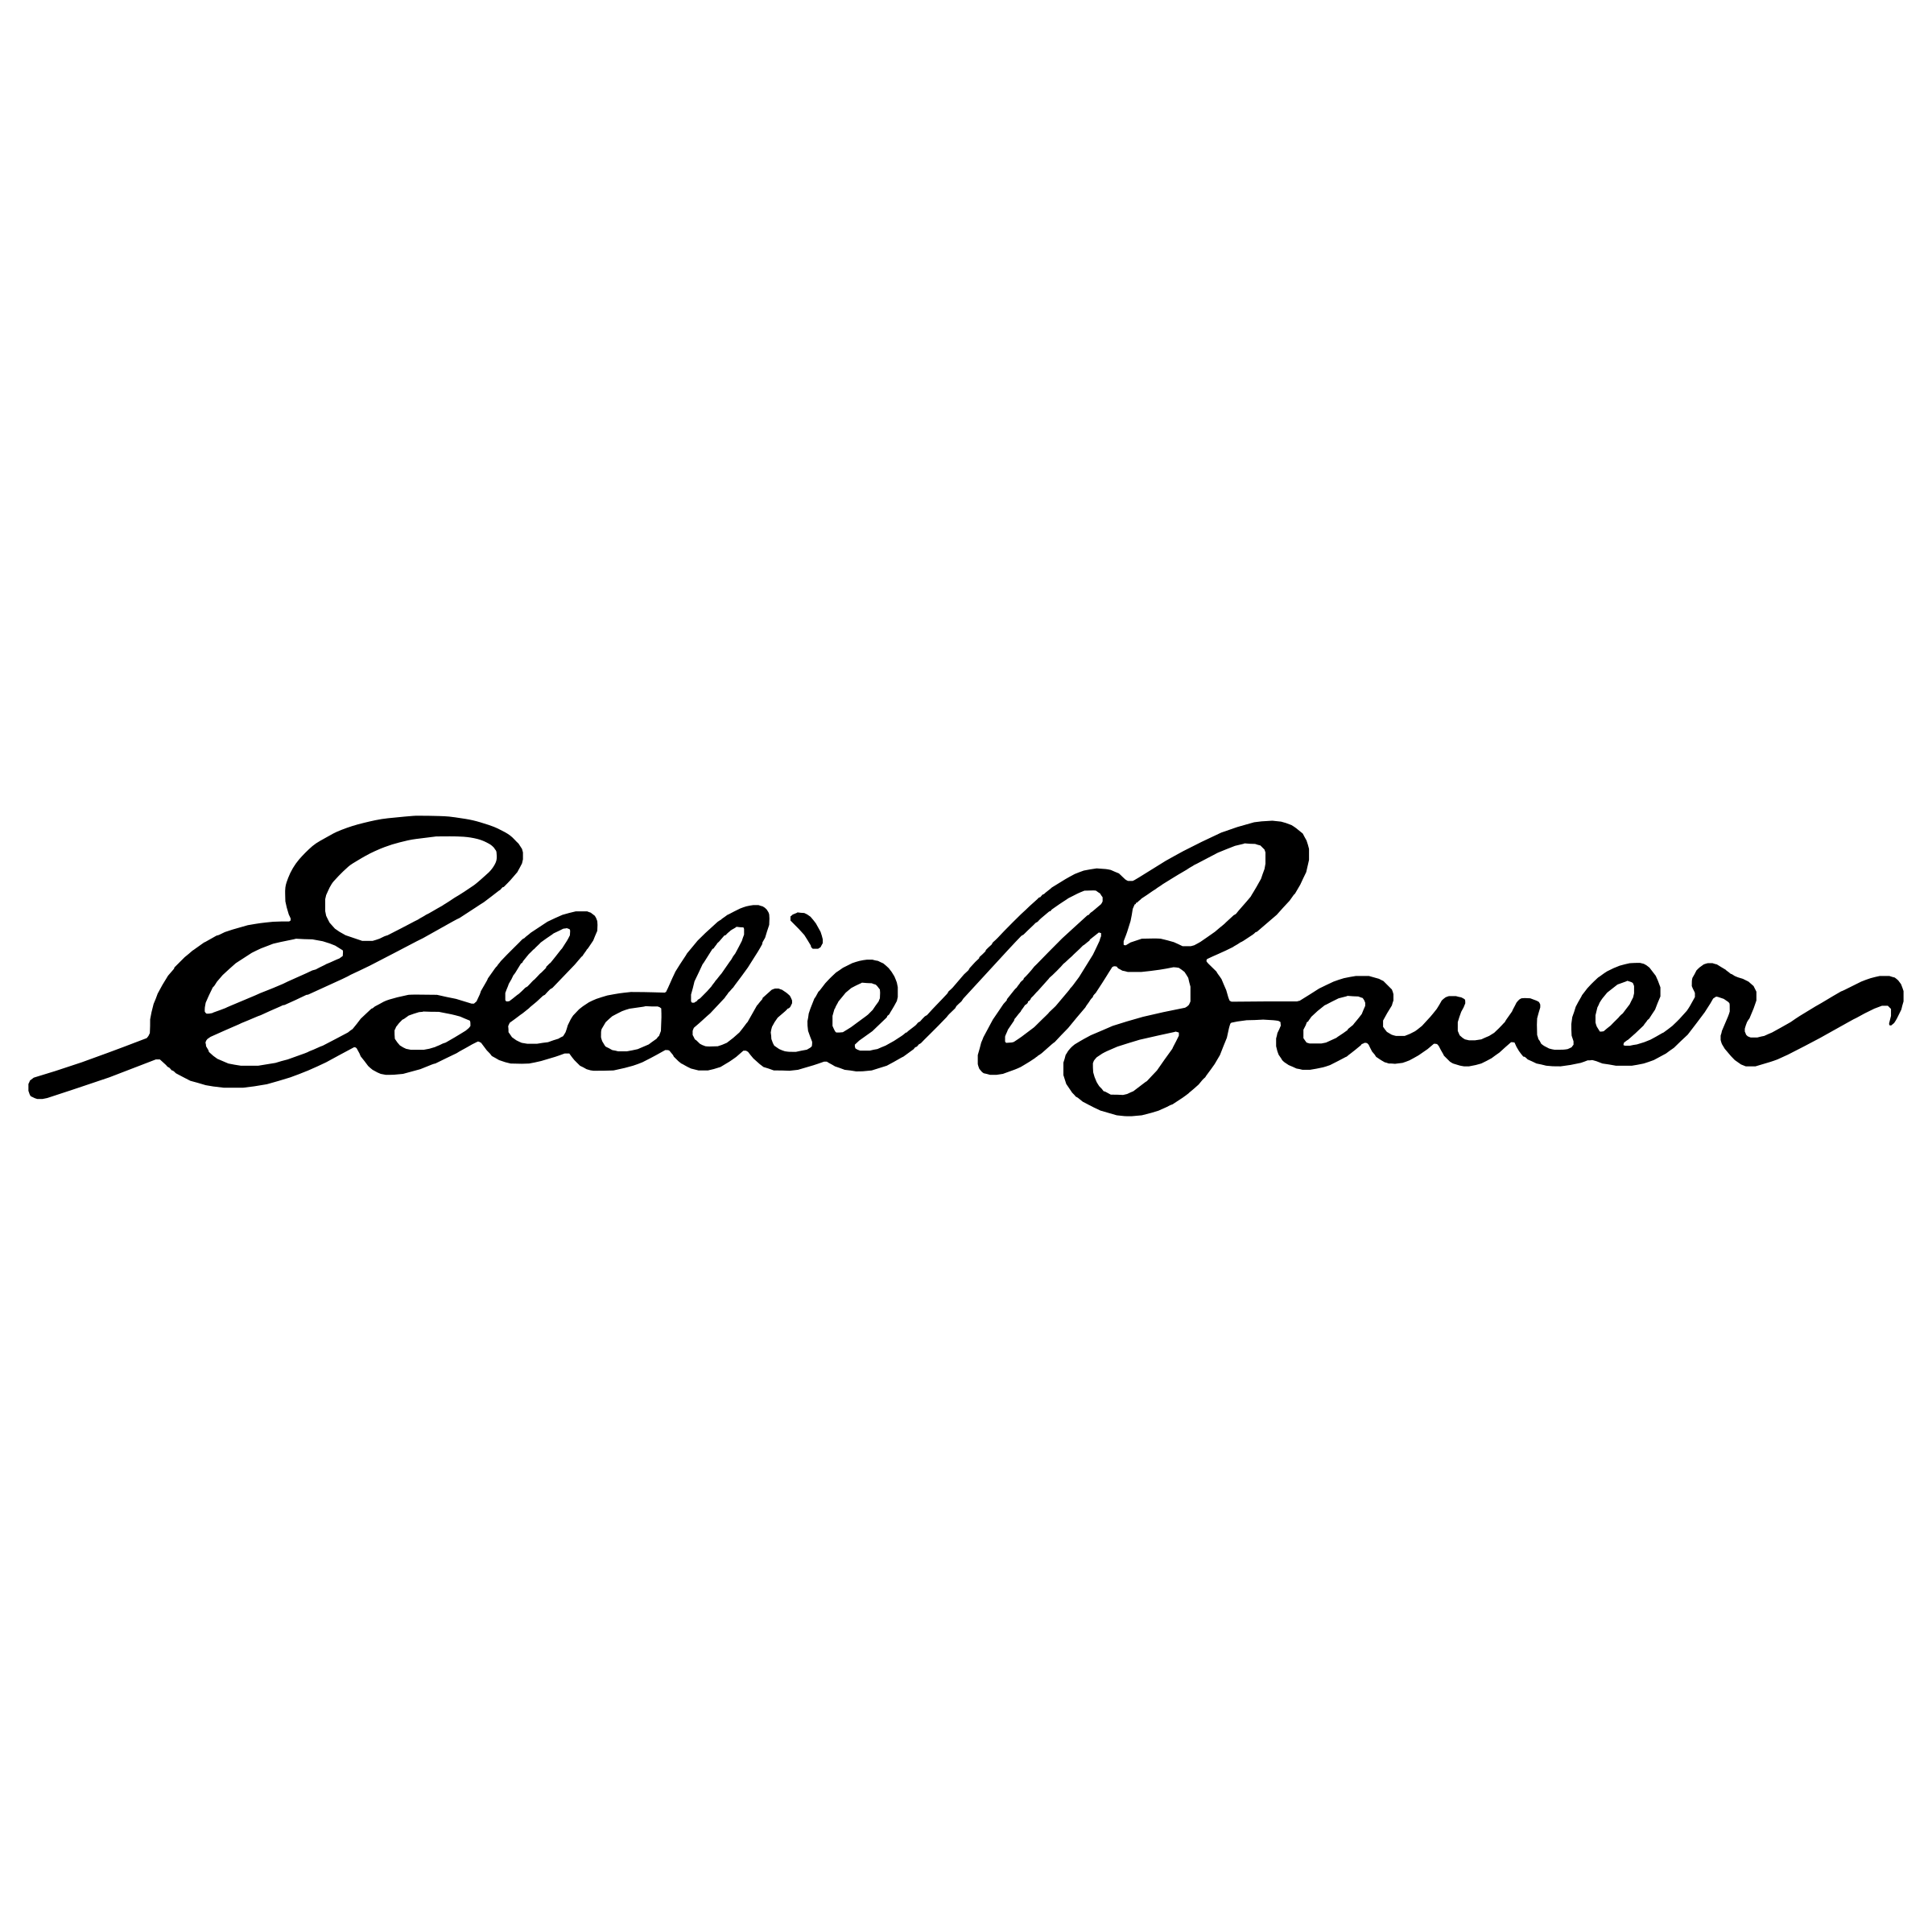 eddie-bauer-logo-black-and-white.png